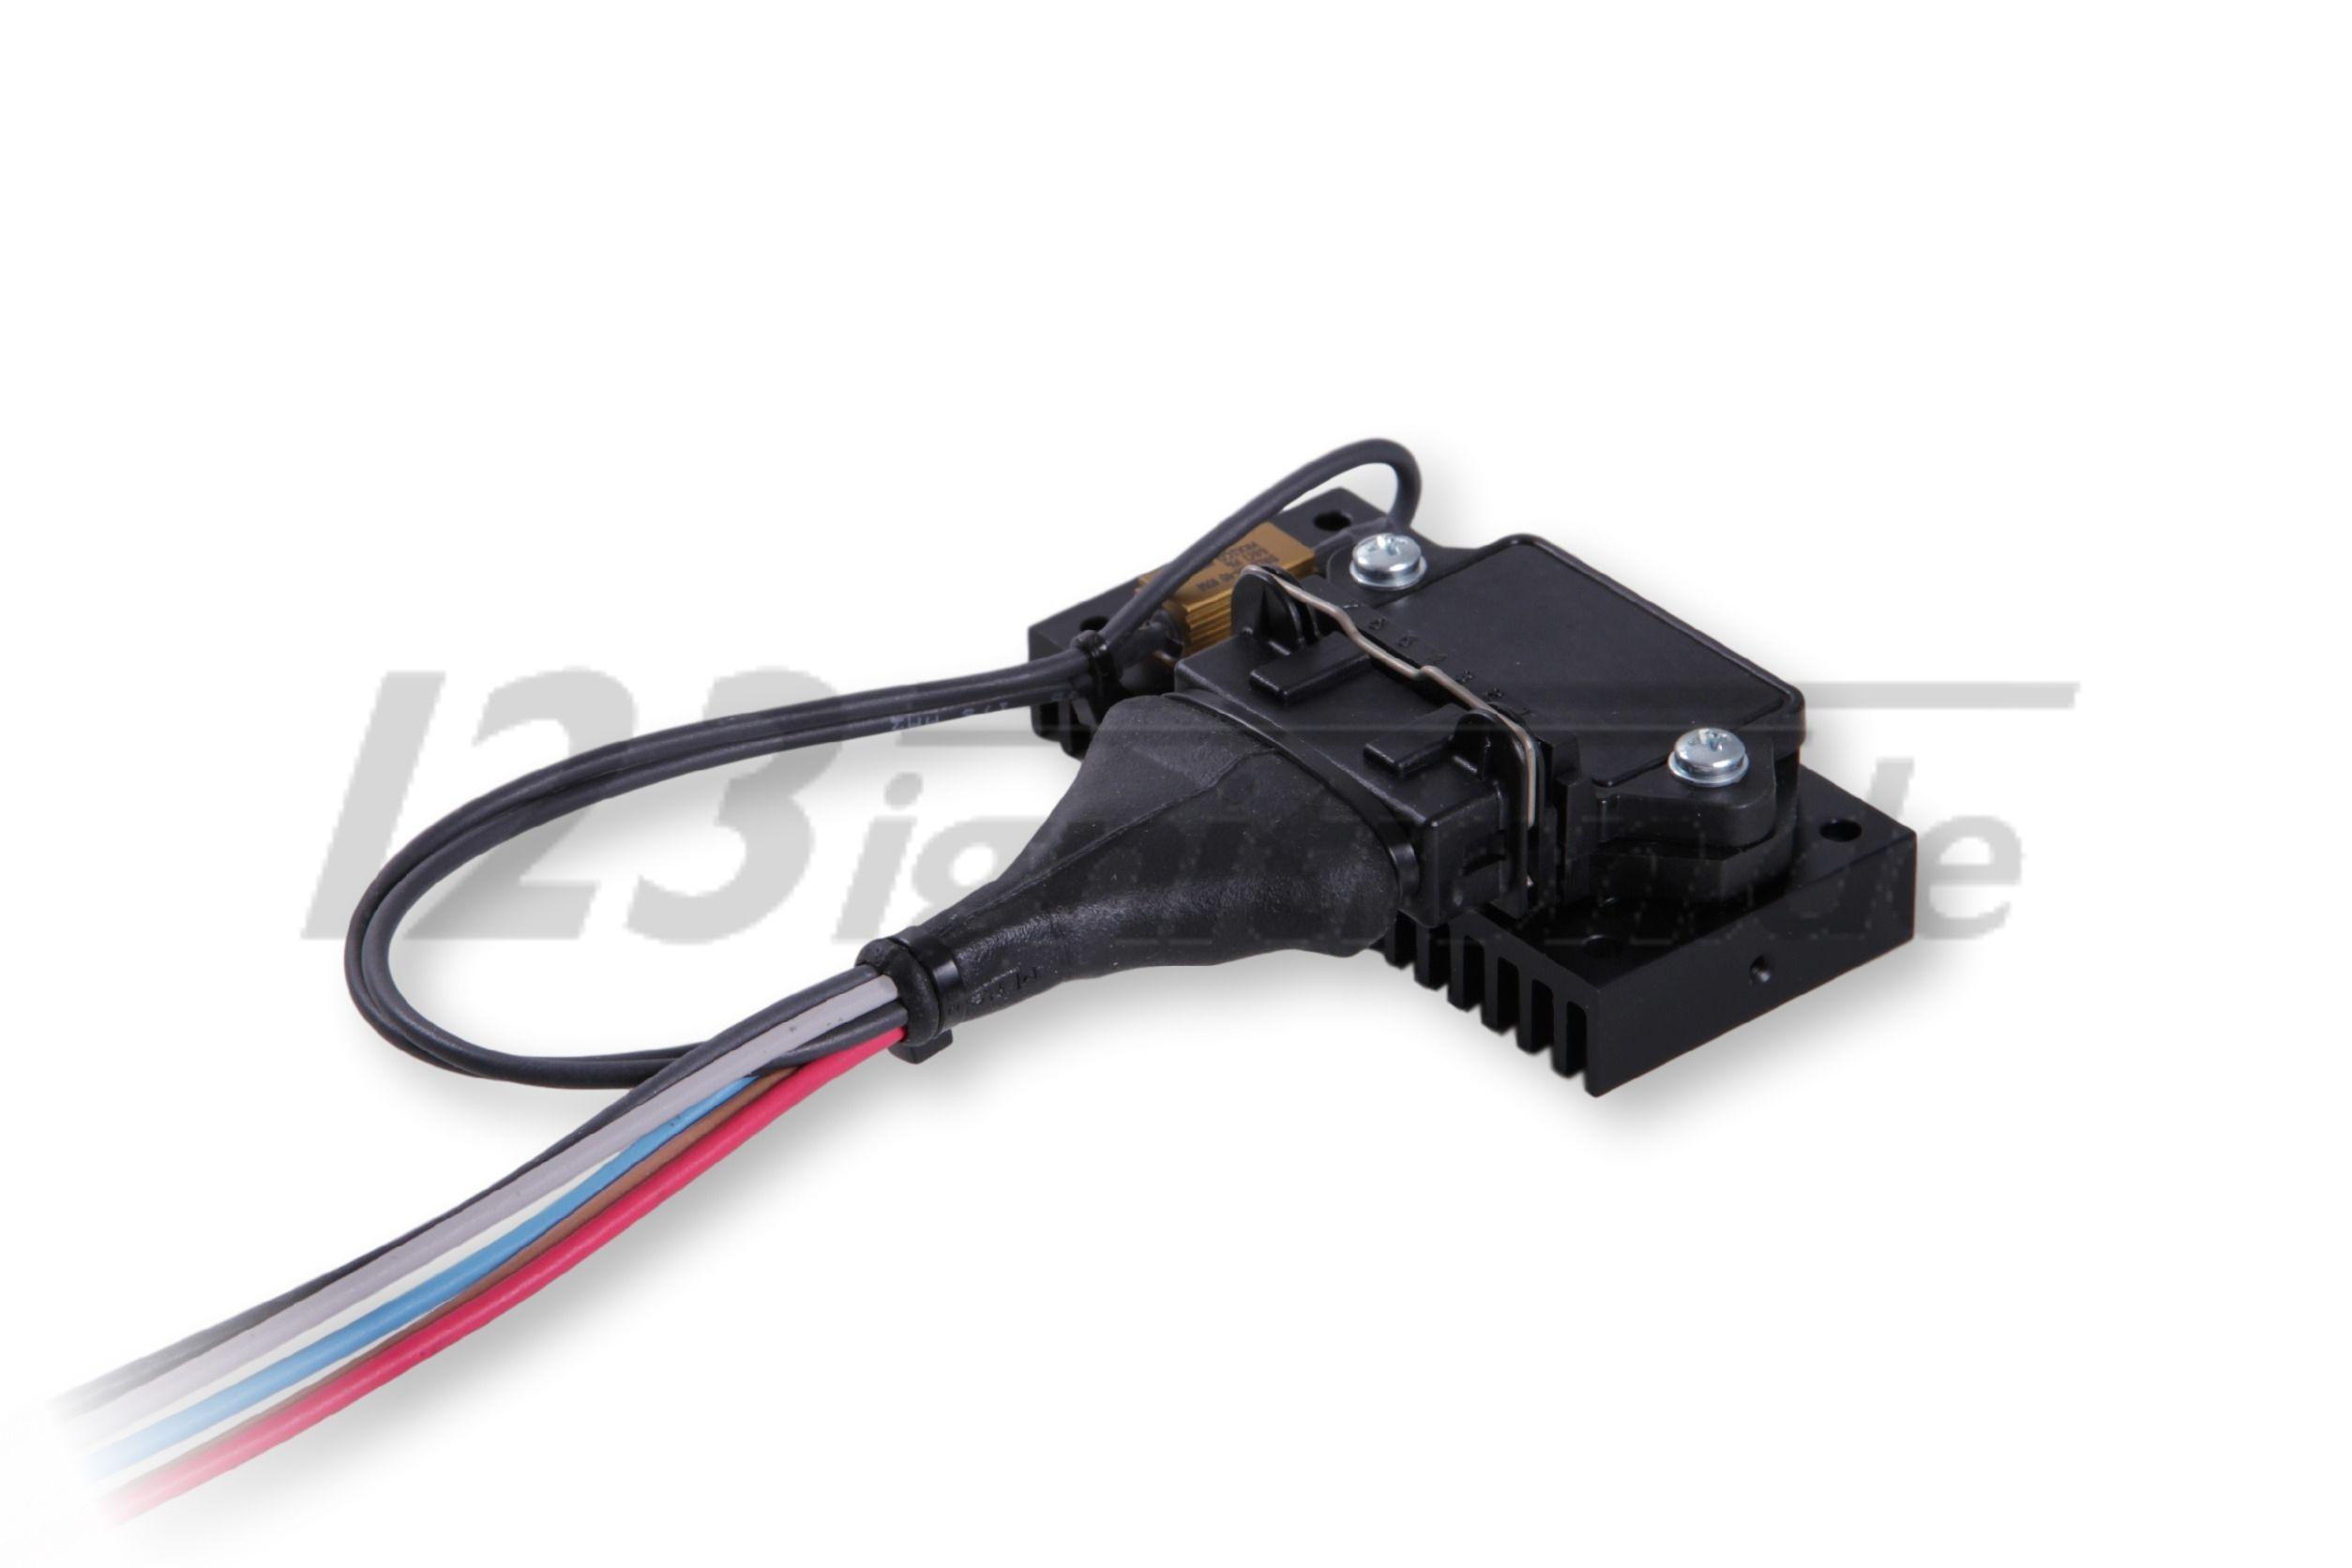 123 ignition   Amplificateur d allumage 123 Big-Fat-Spark   Boutique ... eed9b81589b0